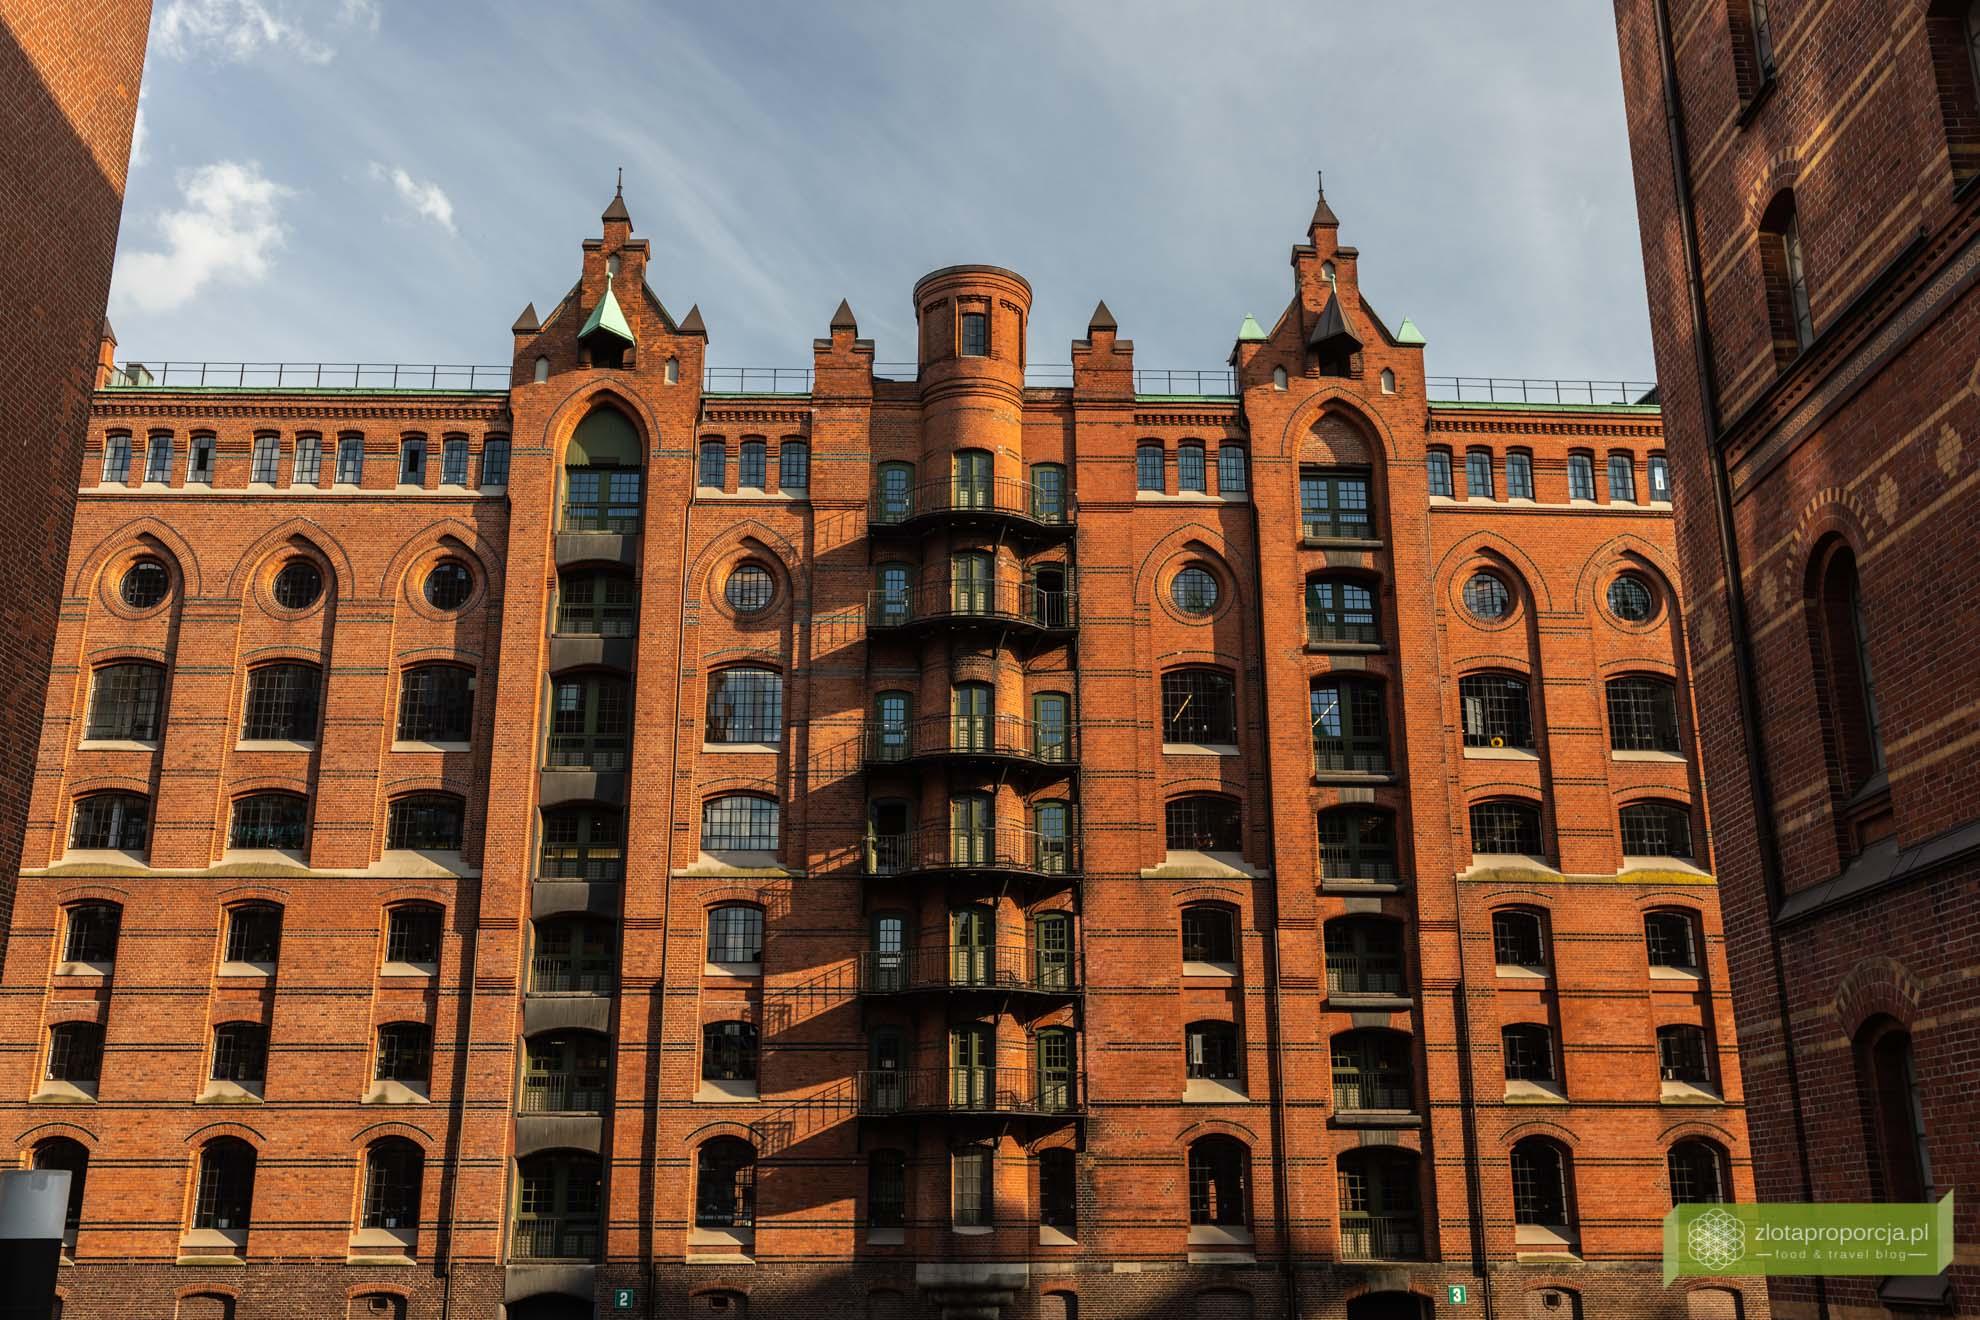 Hamburg, atrakcje Hamburga, Niemcy; Miasto Spichlerzy; dzielnica Spichlerzy w Hamburgu; spichlerze Hamburg;